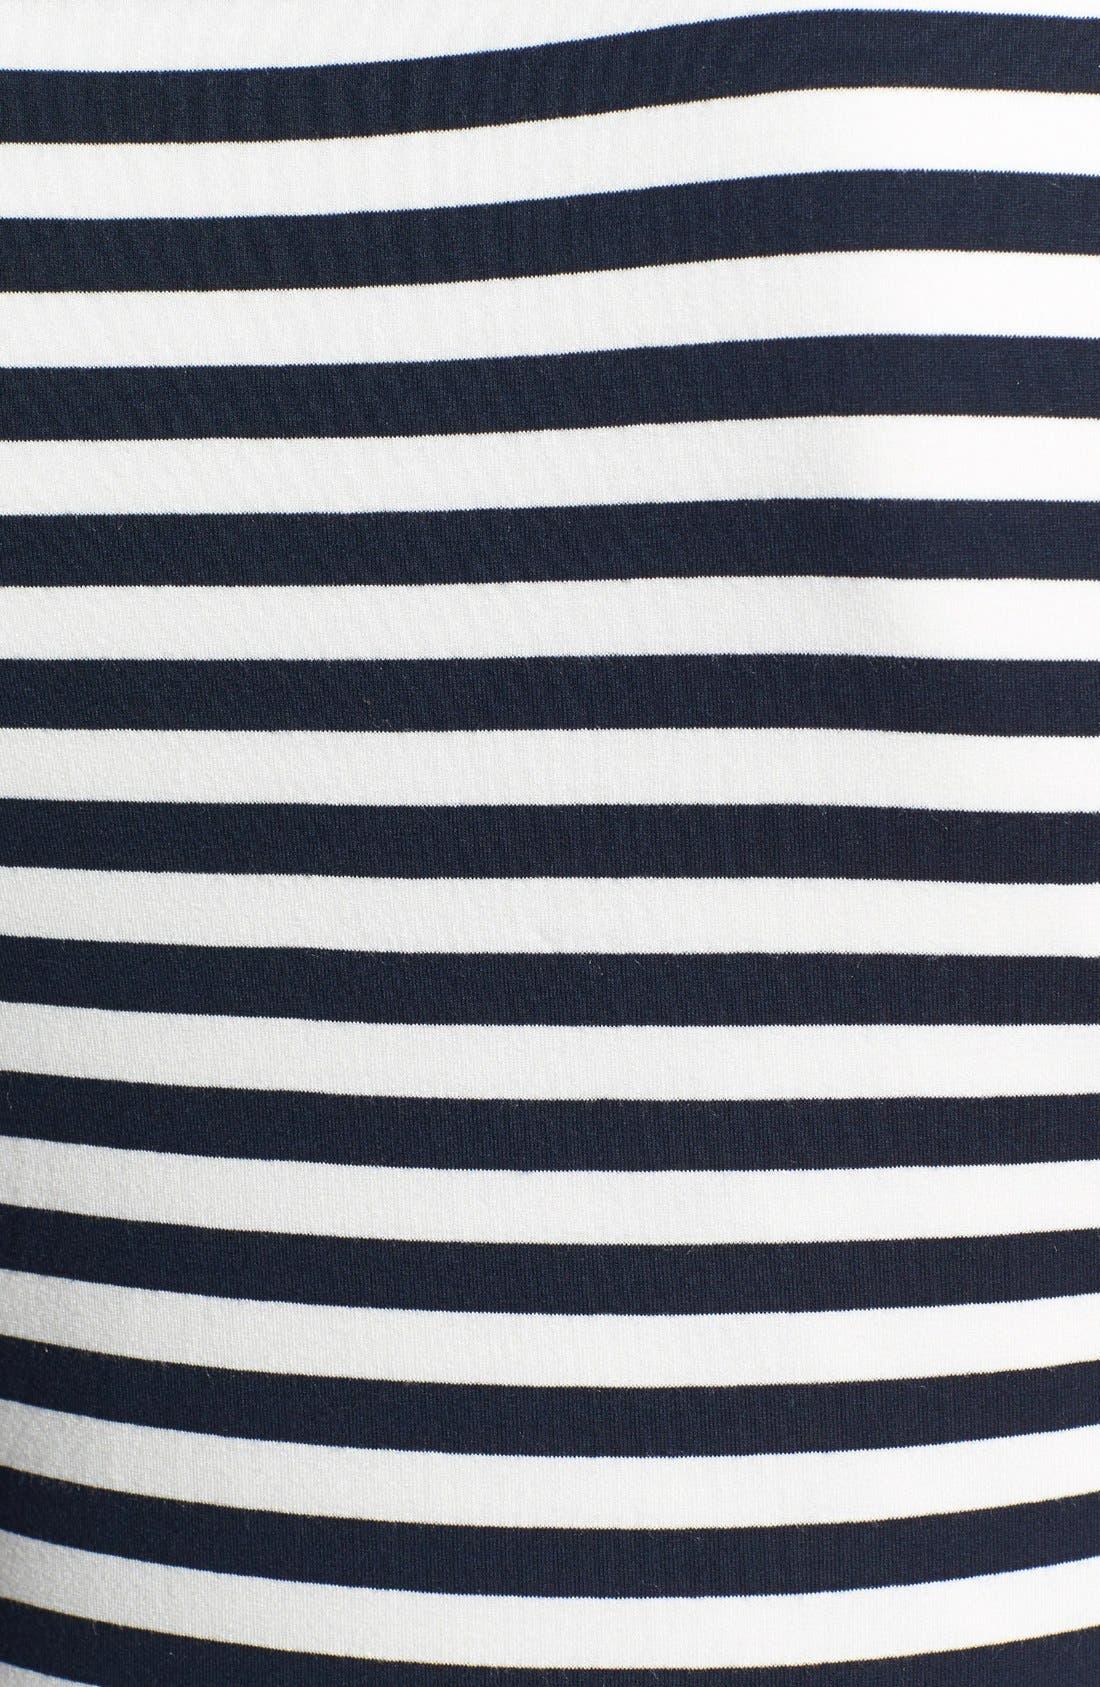 Alternate Image 3  - Vince Camuto 'Marina Stripe' Asymmetrical Top (Regular & Petite)